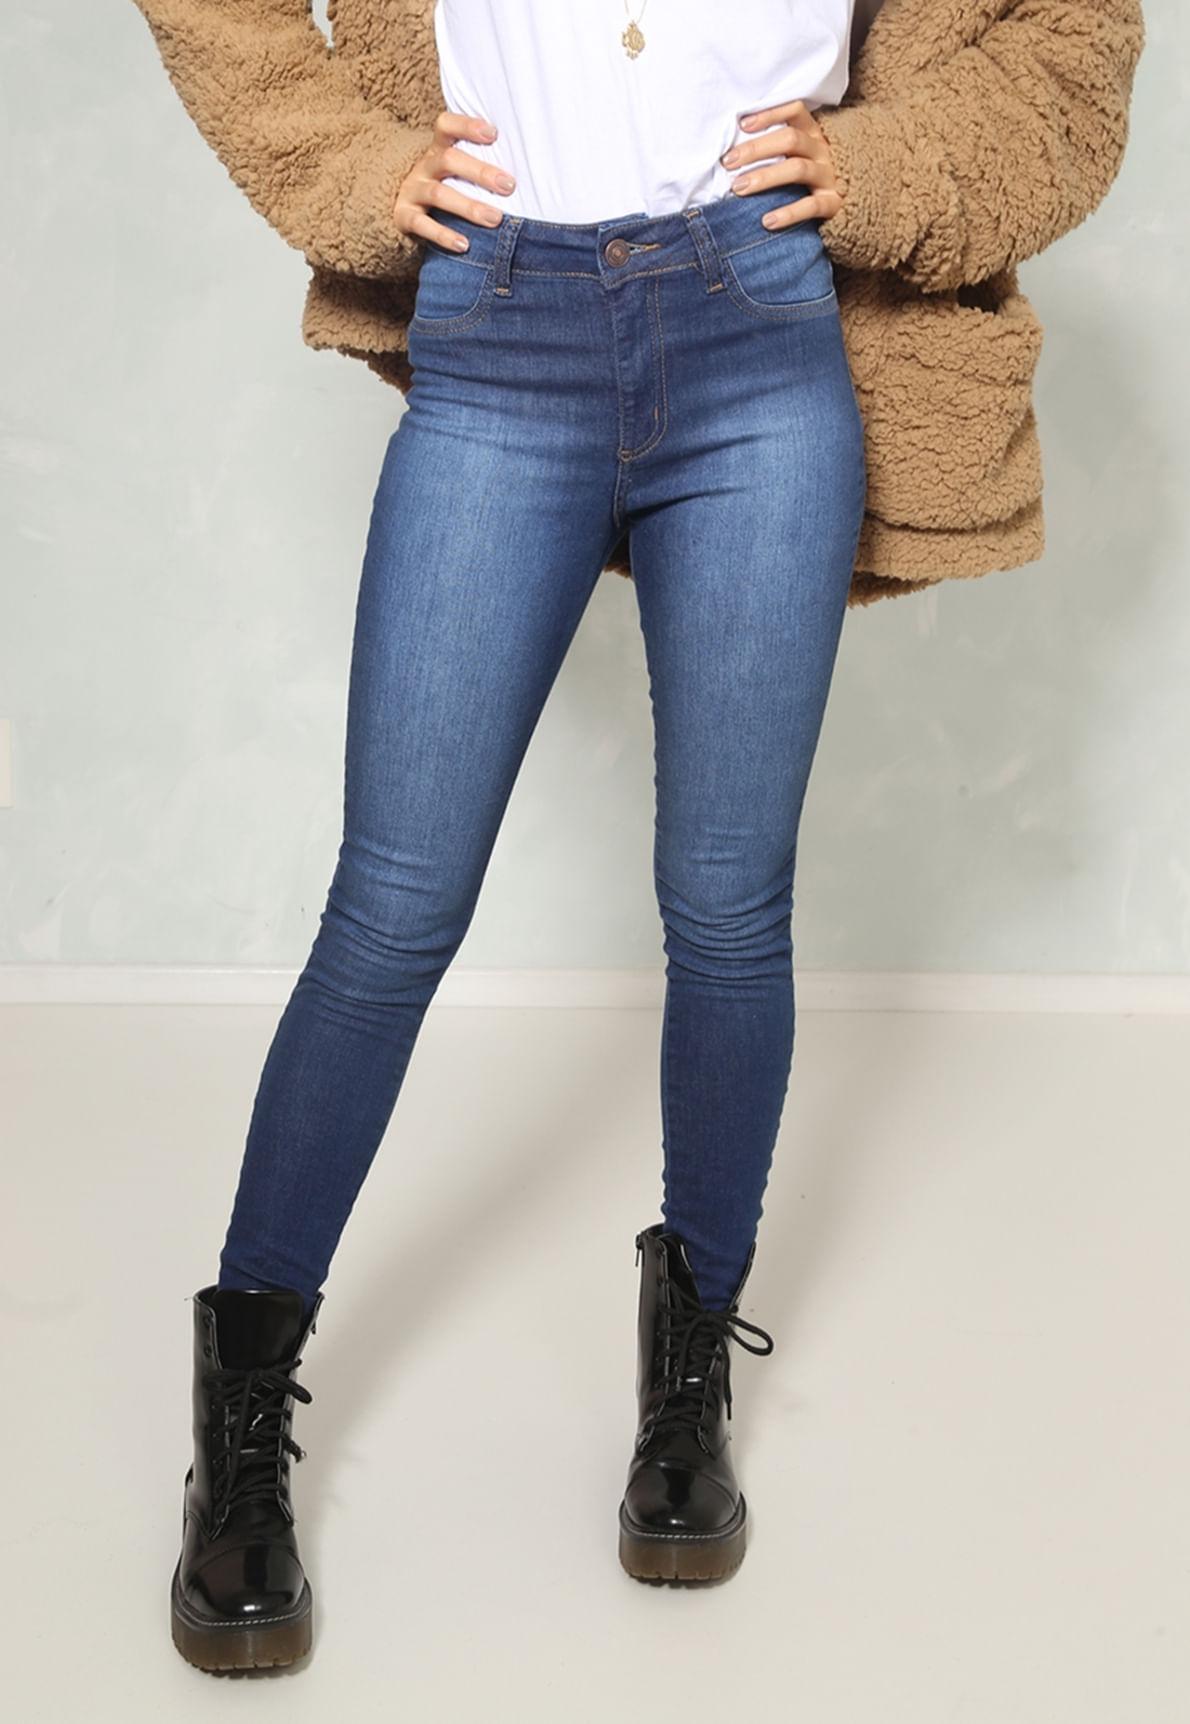 26633-calca-jeans-skinny-erica-mundo-lolita-06